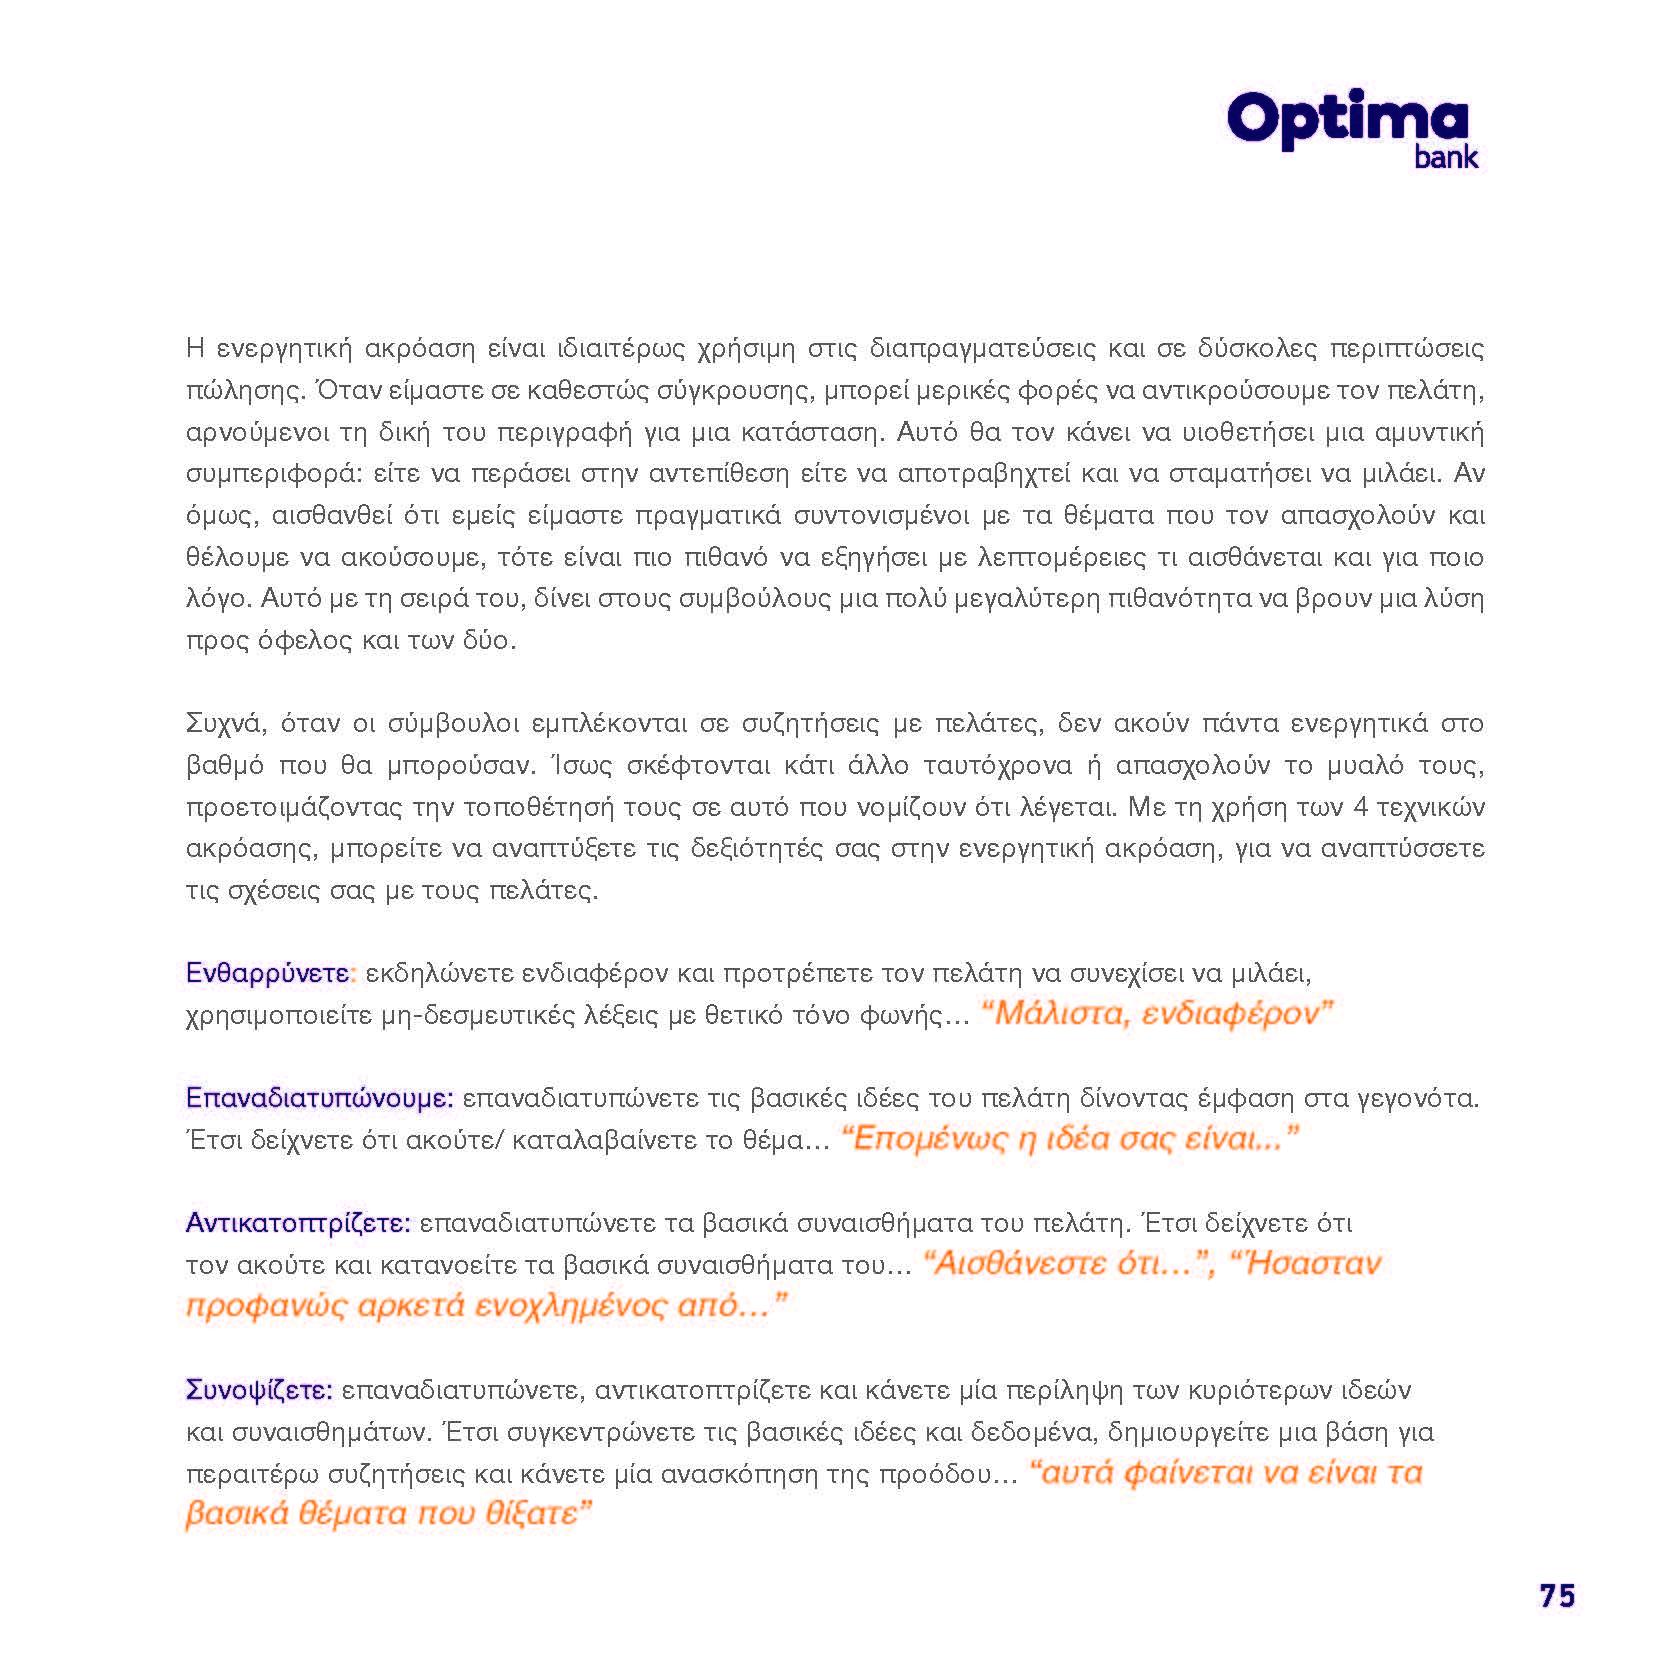 https://www.jib.gr/wp-content/uploads/2020/09/OPTIMA-BANK-BOOKLET-WEB_Page_075.jpg